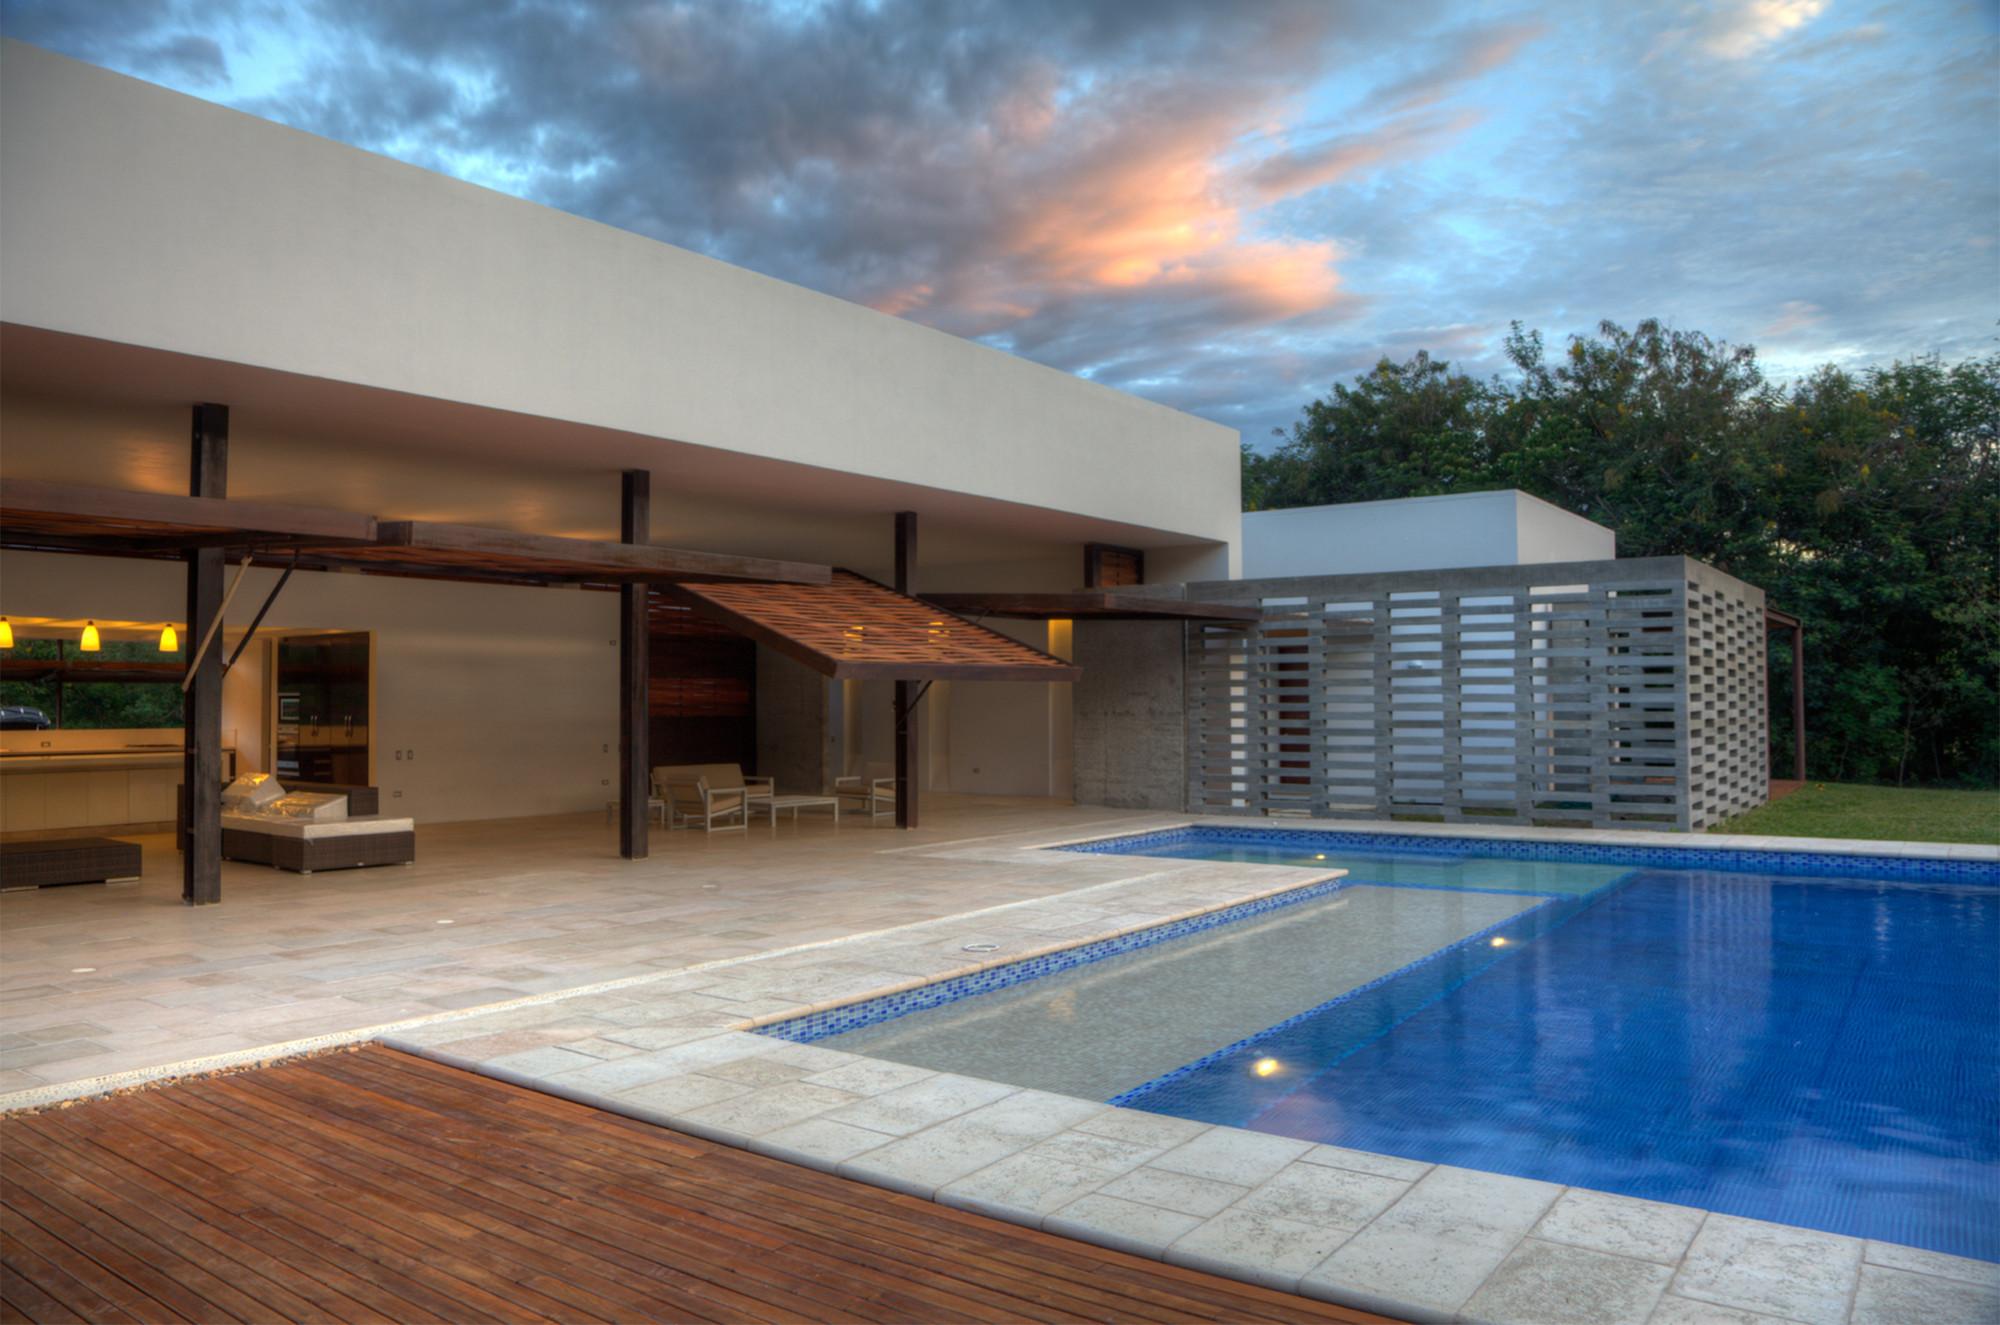 House 60 / De La Carrera - Cavanzo Arquitectura, © Luis Alberto Mariño